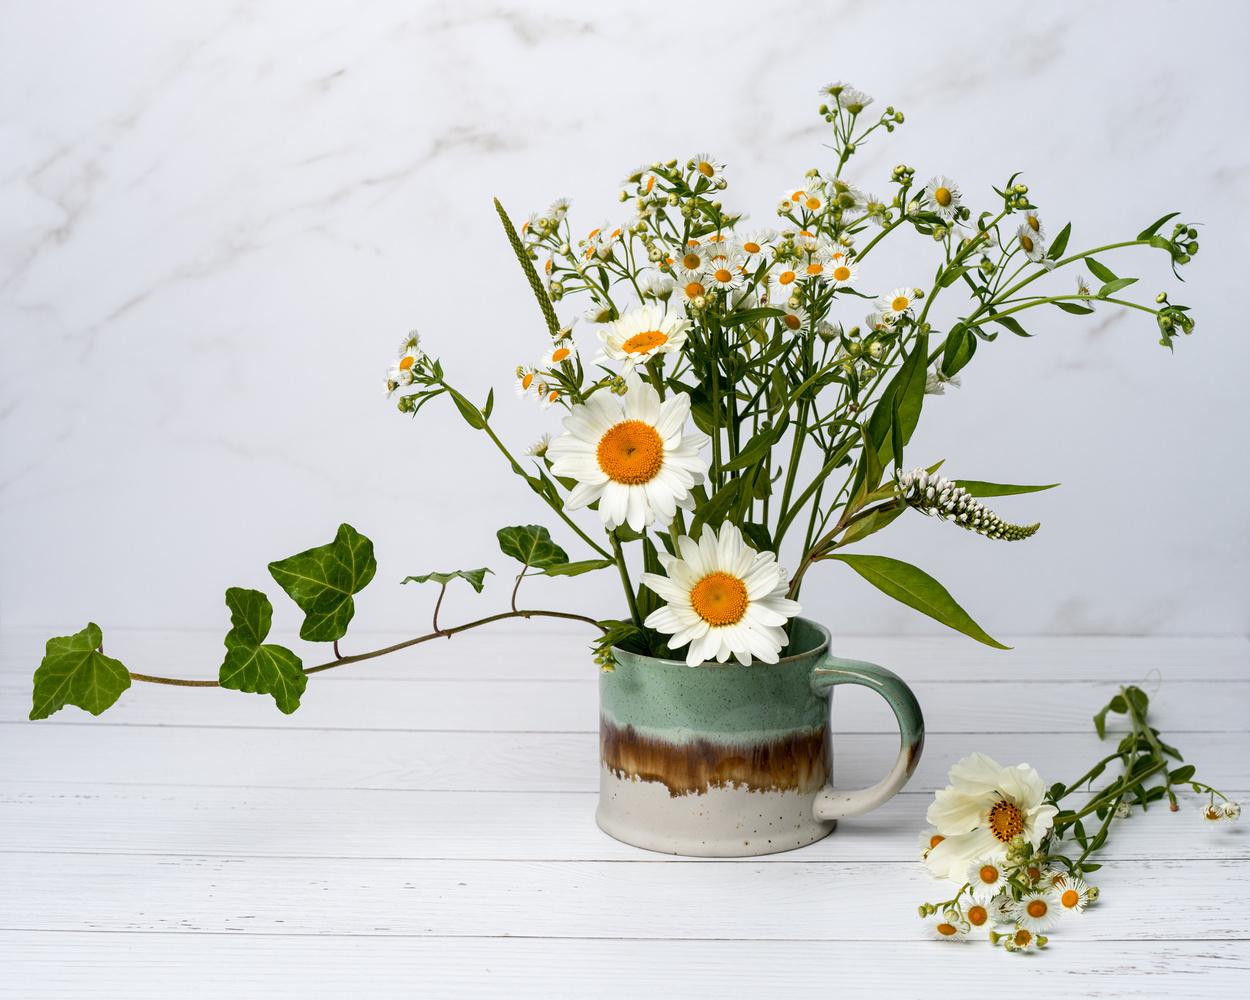 Flowers from my garden by Skyler Ewing